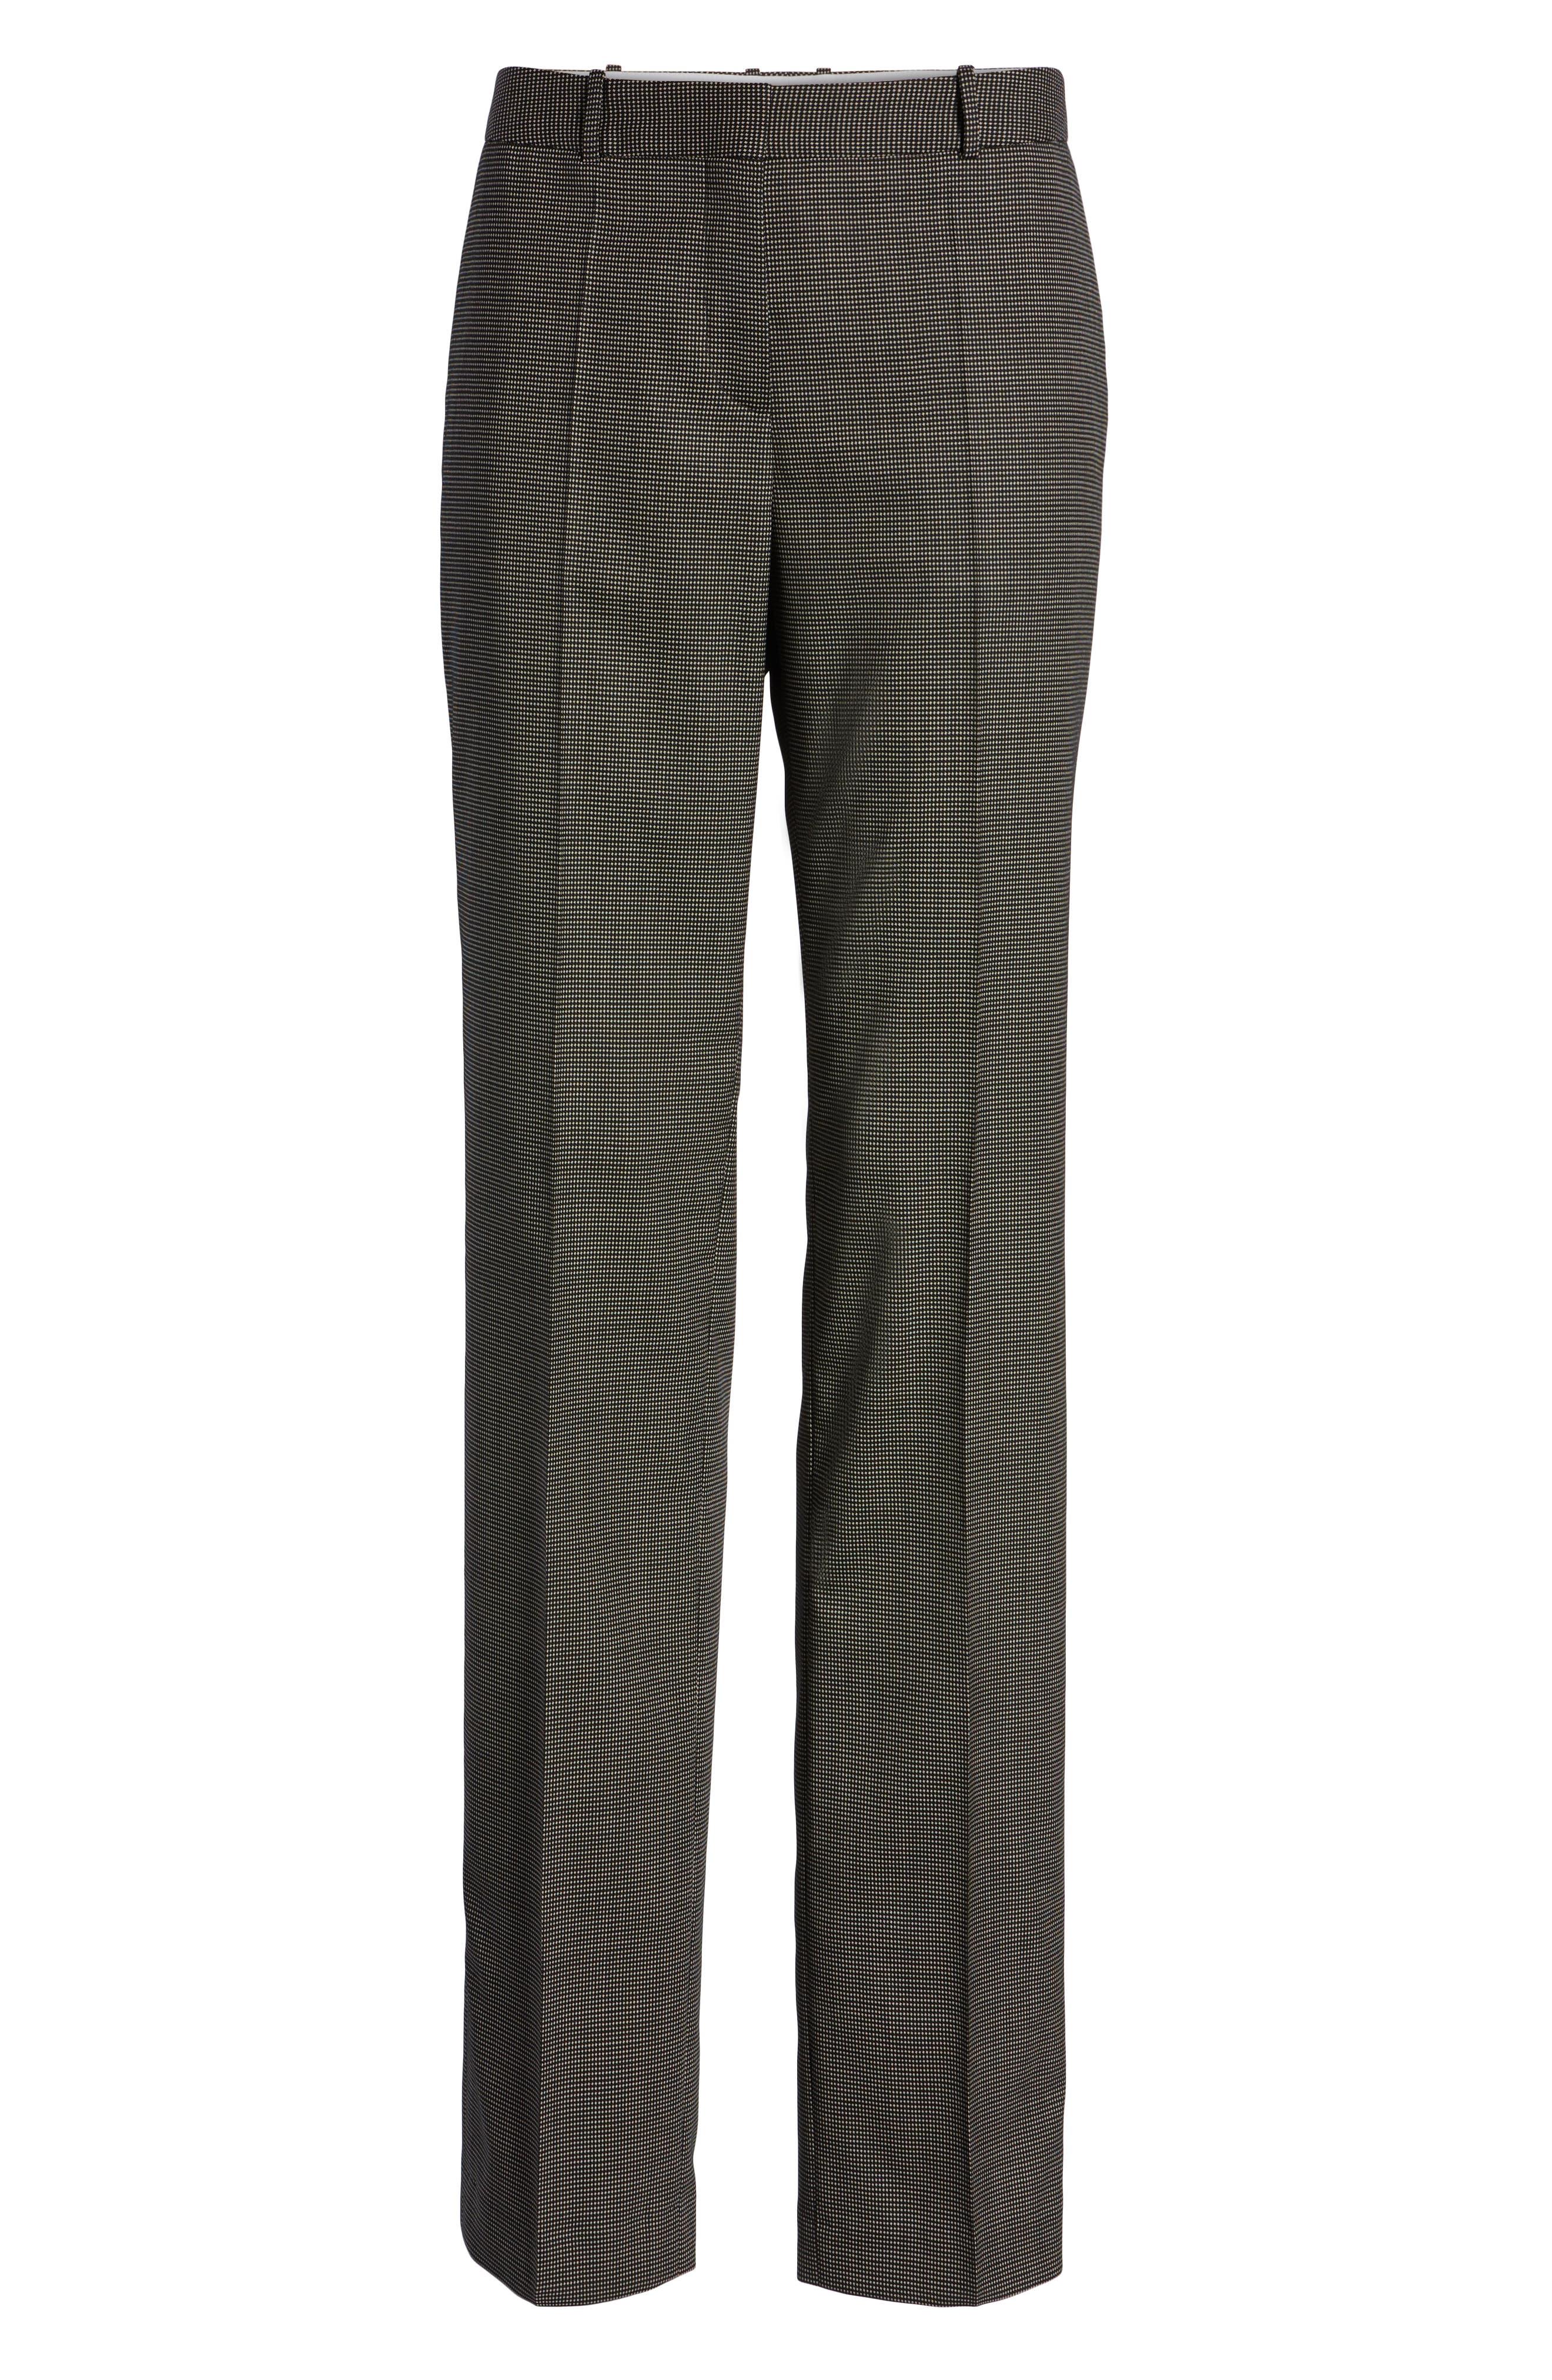 Tamea Minidessin Pants,                             Alternate thumbnail 6, color,                             071